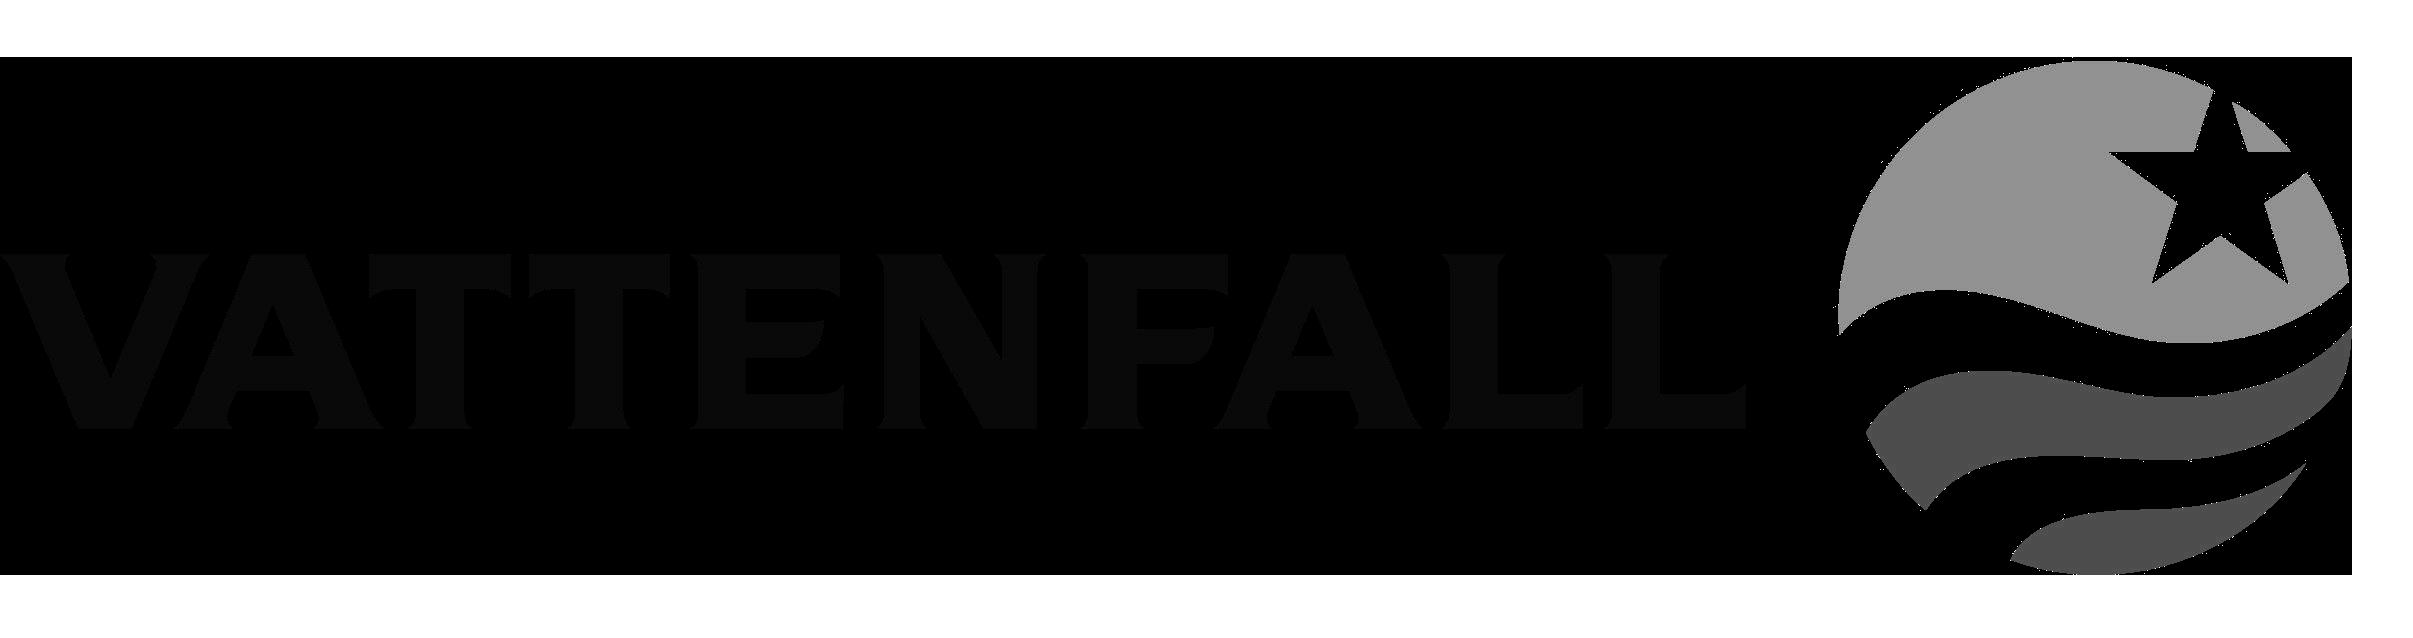 vattenfall_logo copy.png